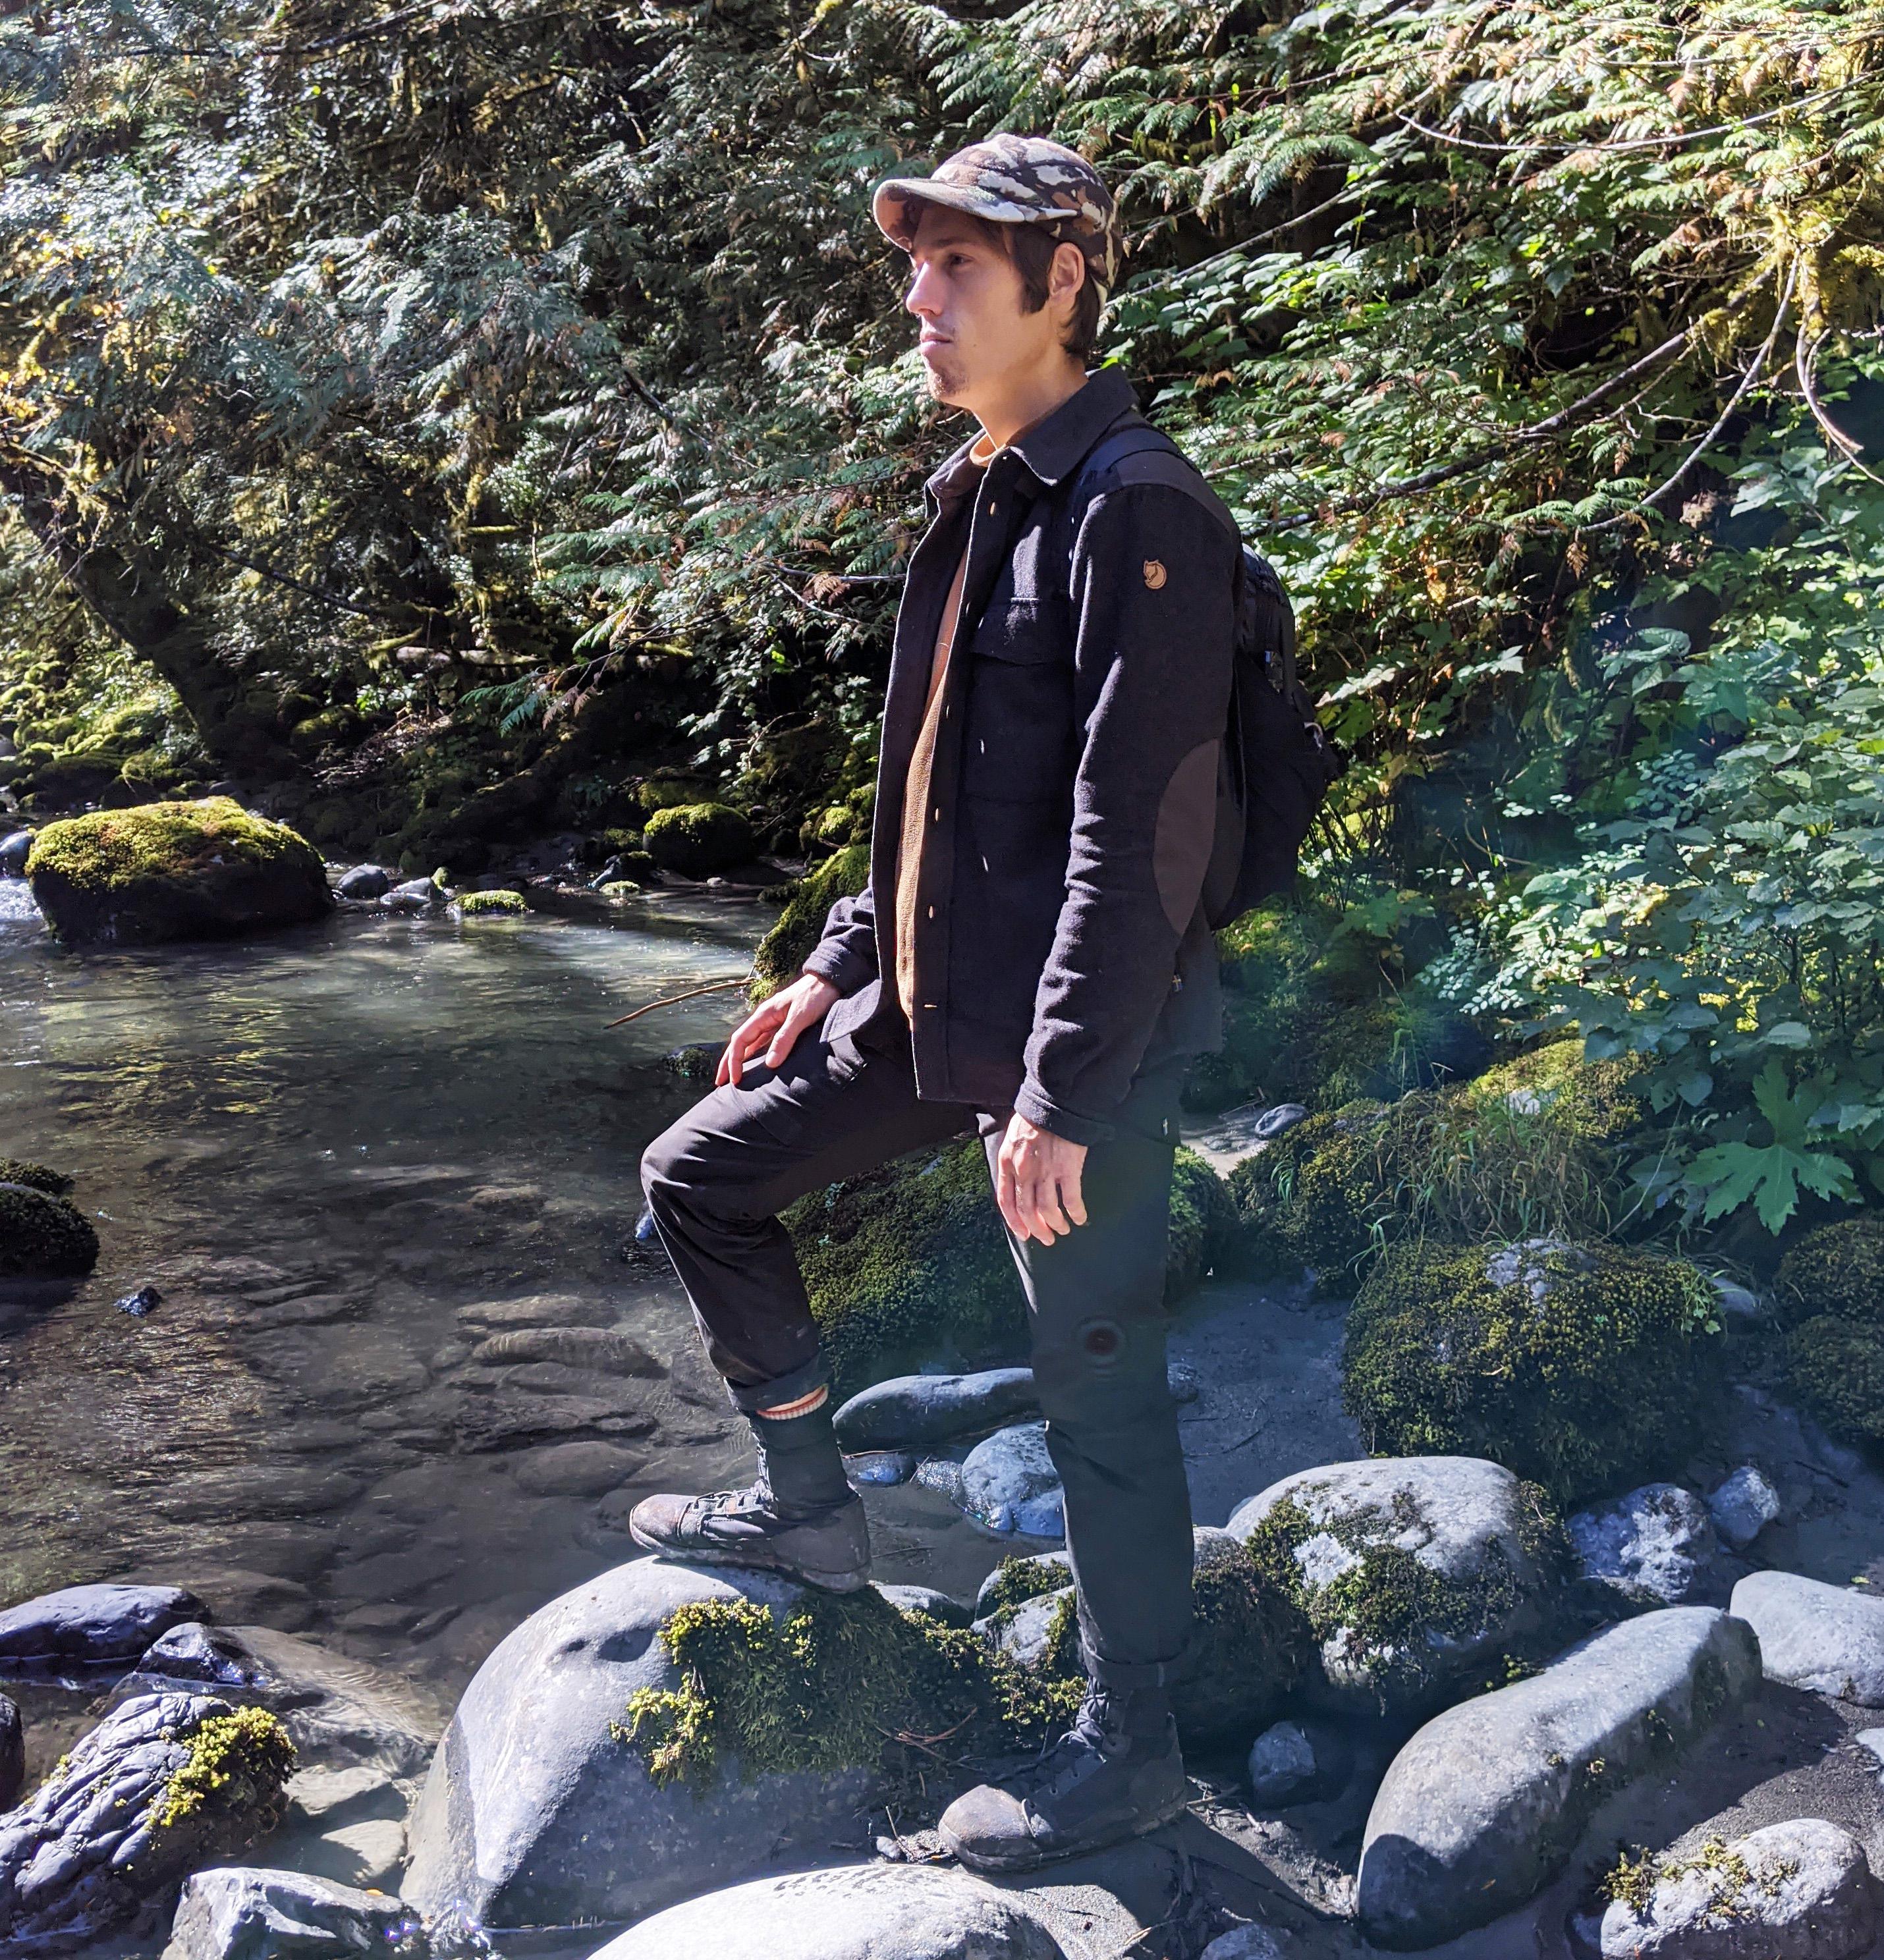 Hudson Gardner on the Dosewallips river